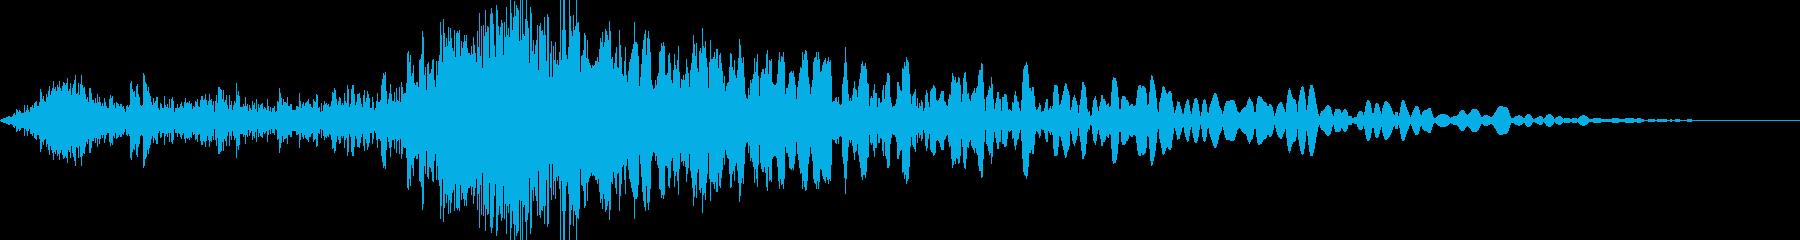 FPS リアル系 大斧 攻撃動作音の再生済みの波形